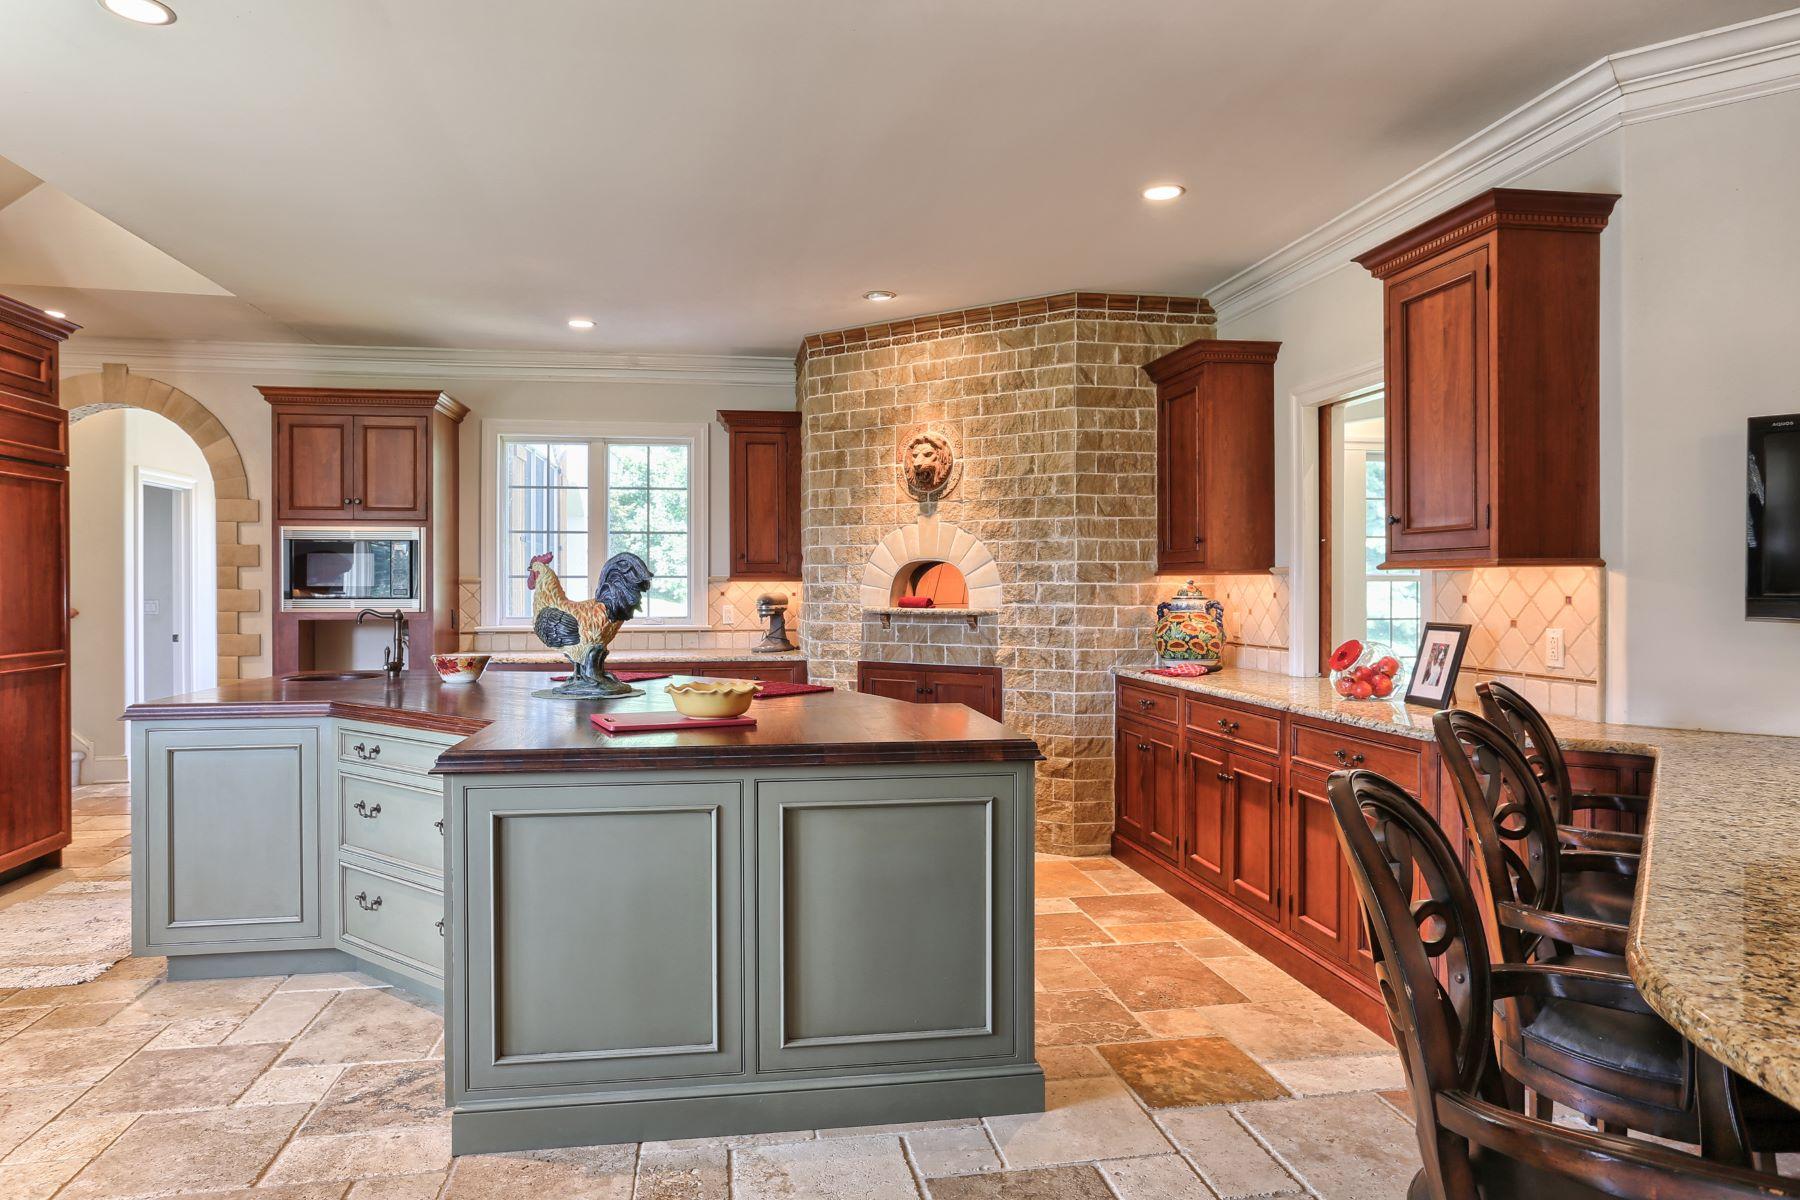 Additional photo for property listing at 380 Rineer Road  Conestoga, Pennsylvania 17516 Estados Unidos